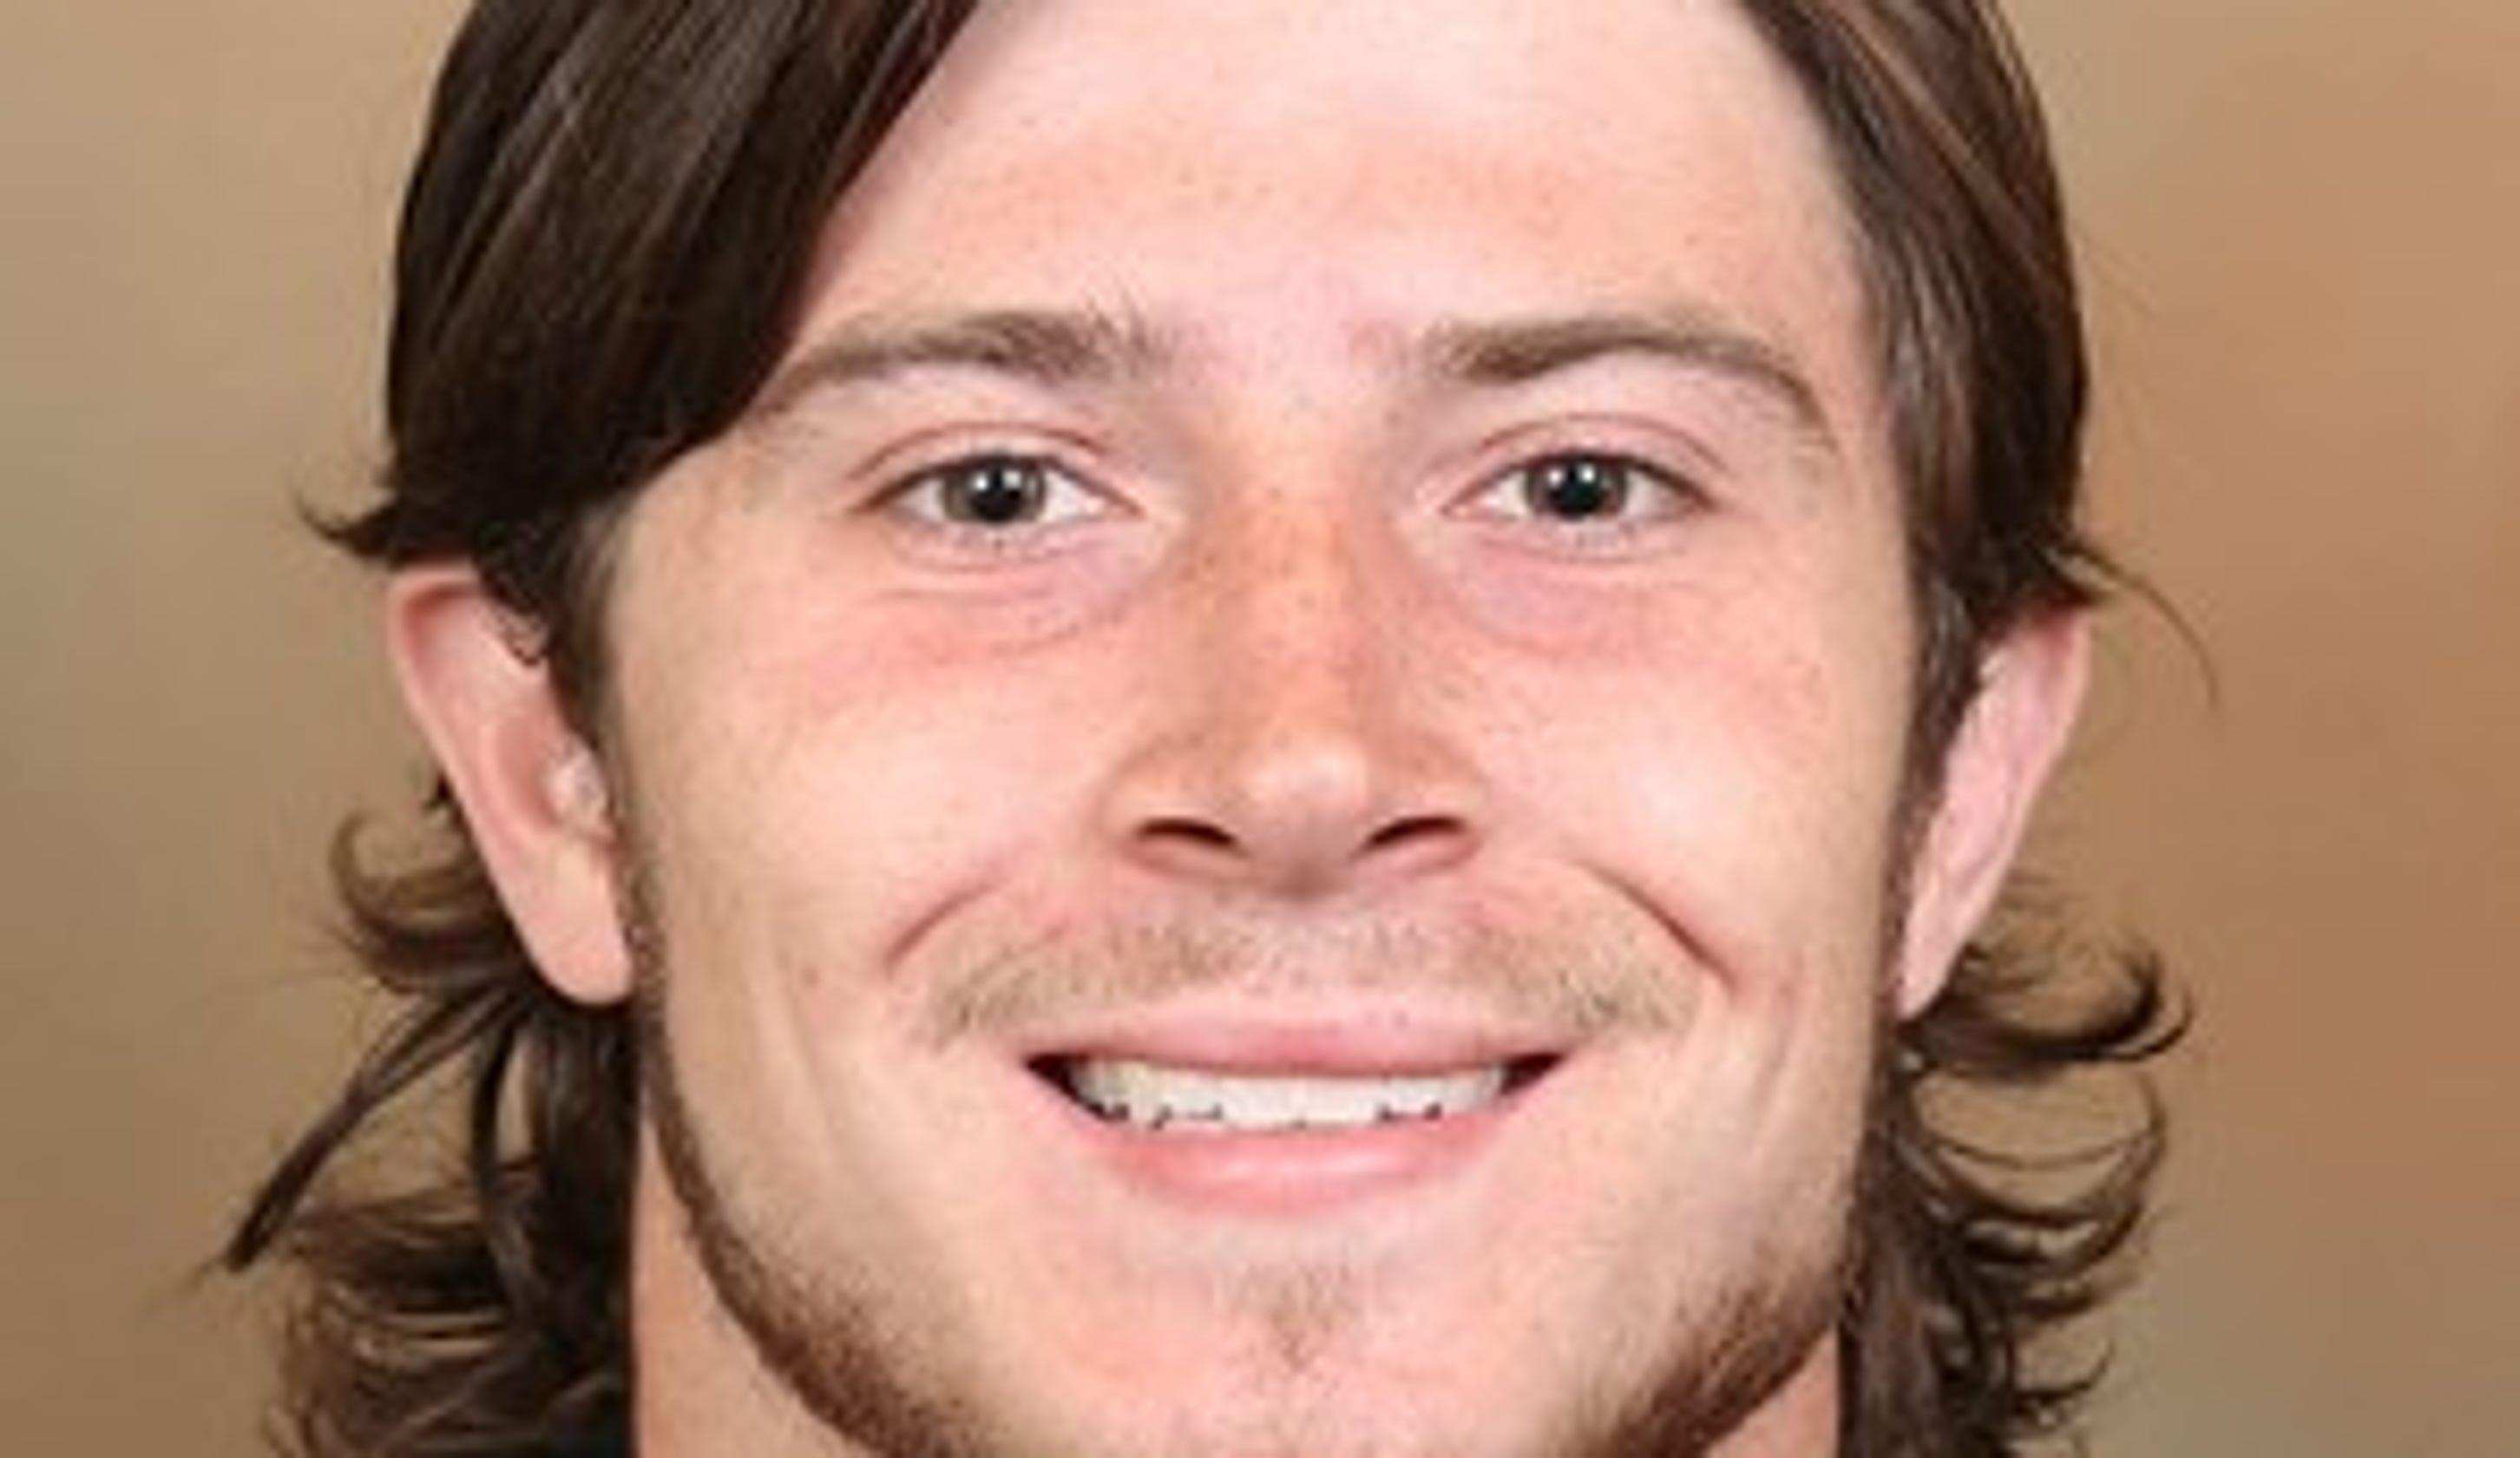 Eastern Kentucky University football player shot, injured in